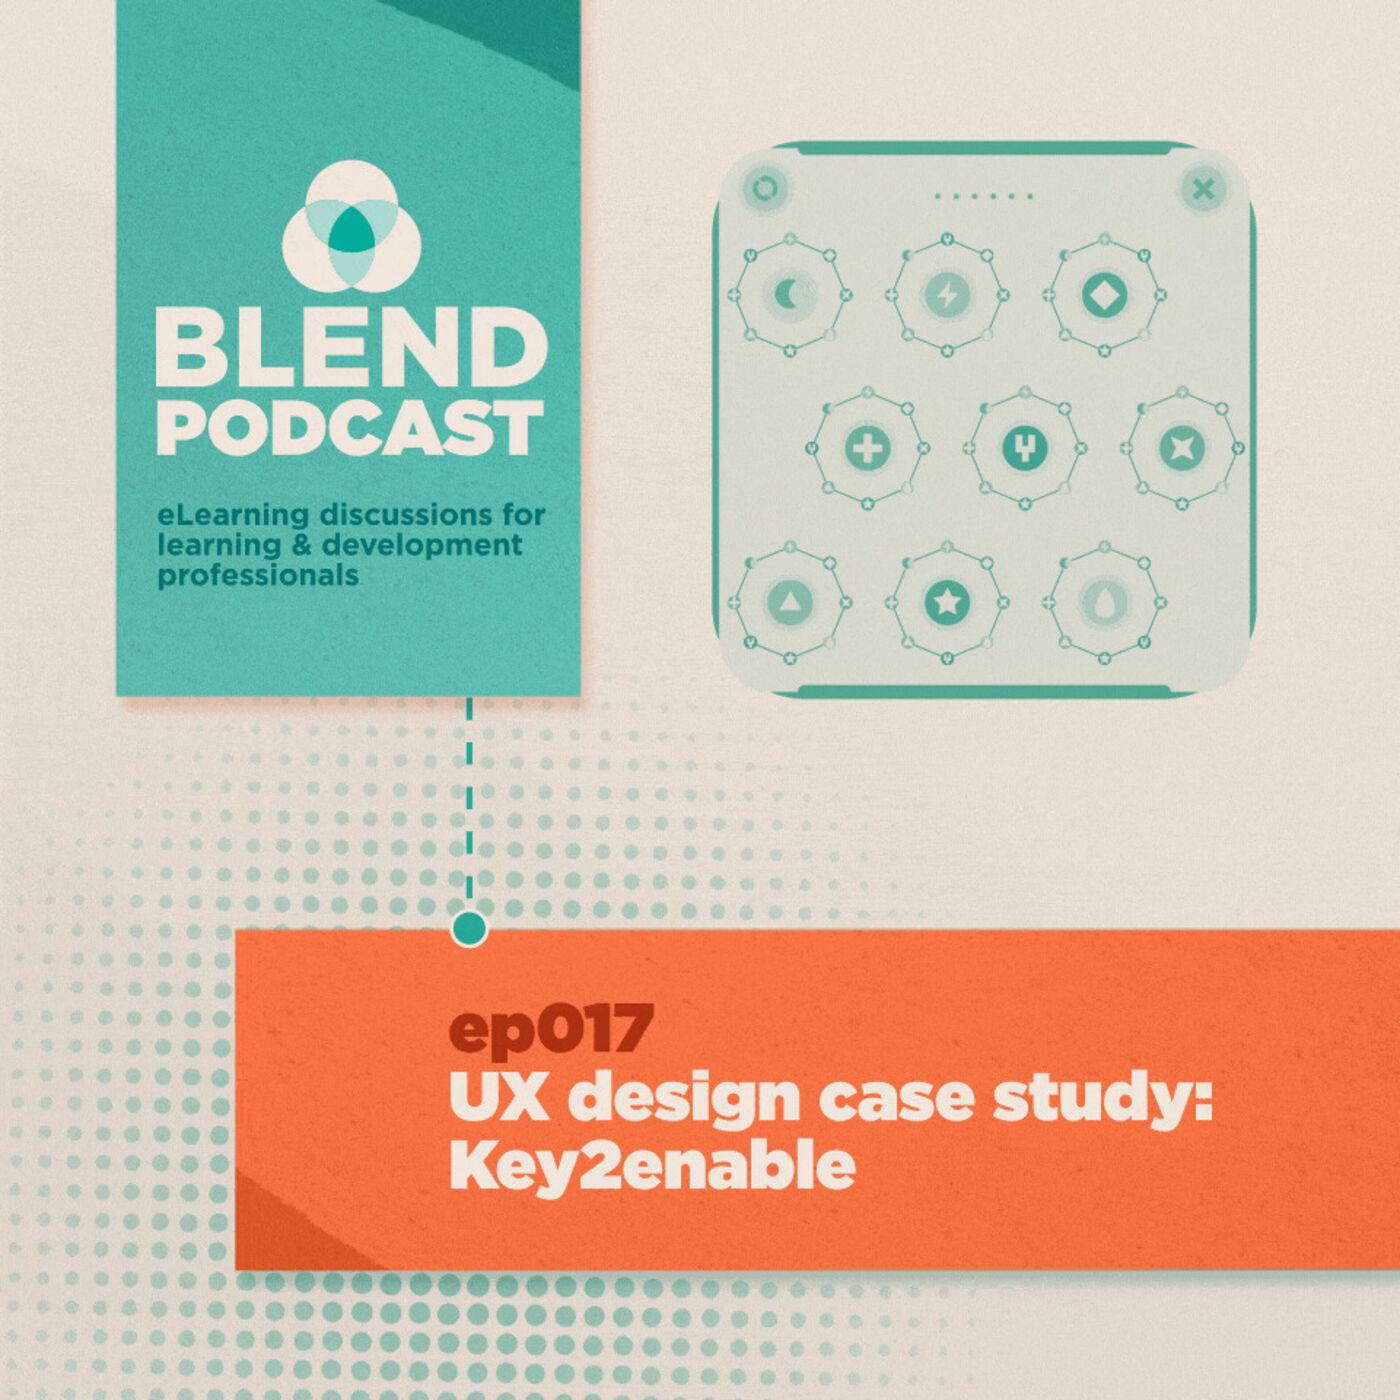 #17 UX Design Case Study - Key2Enable